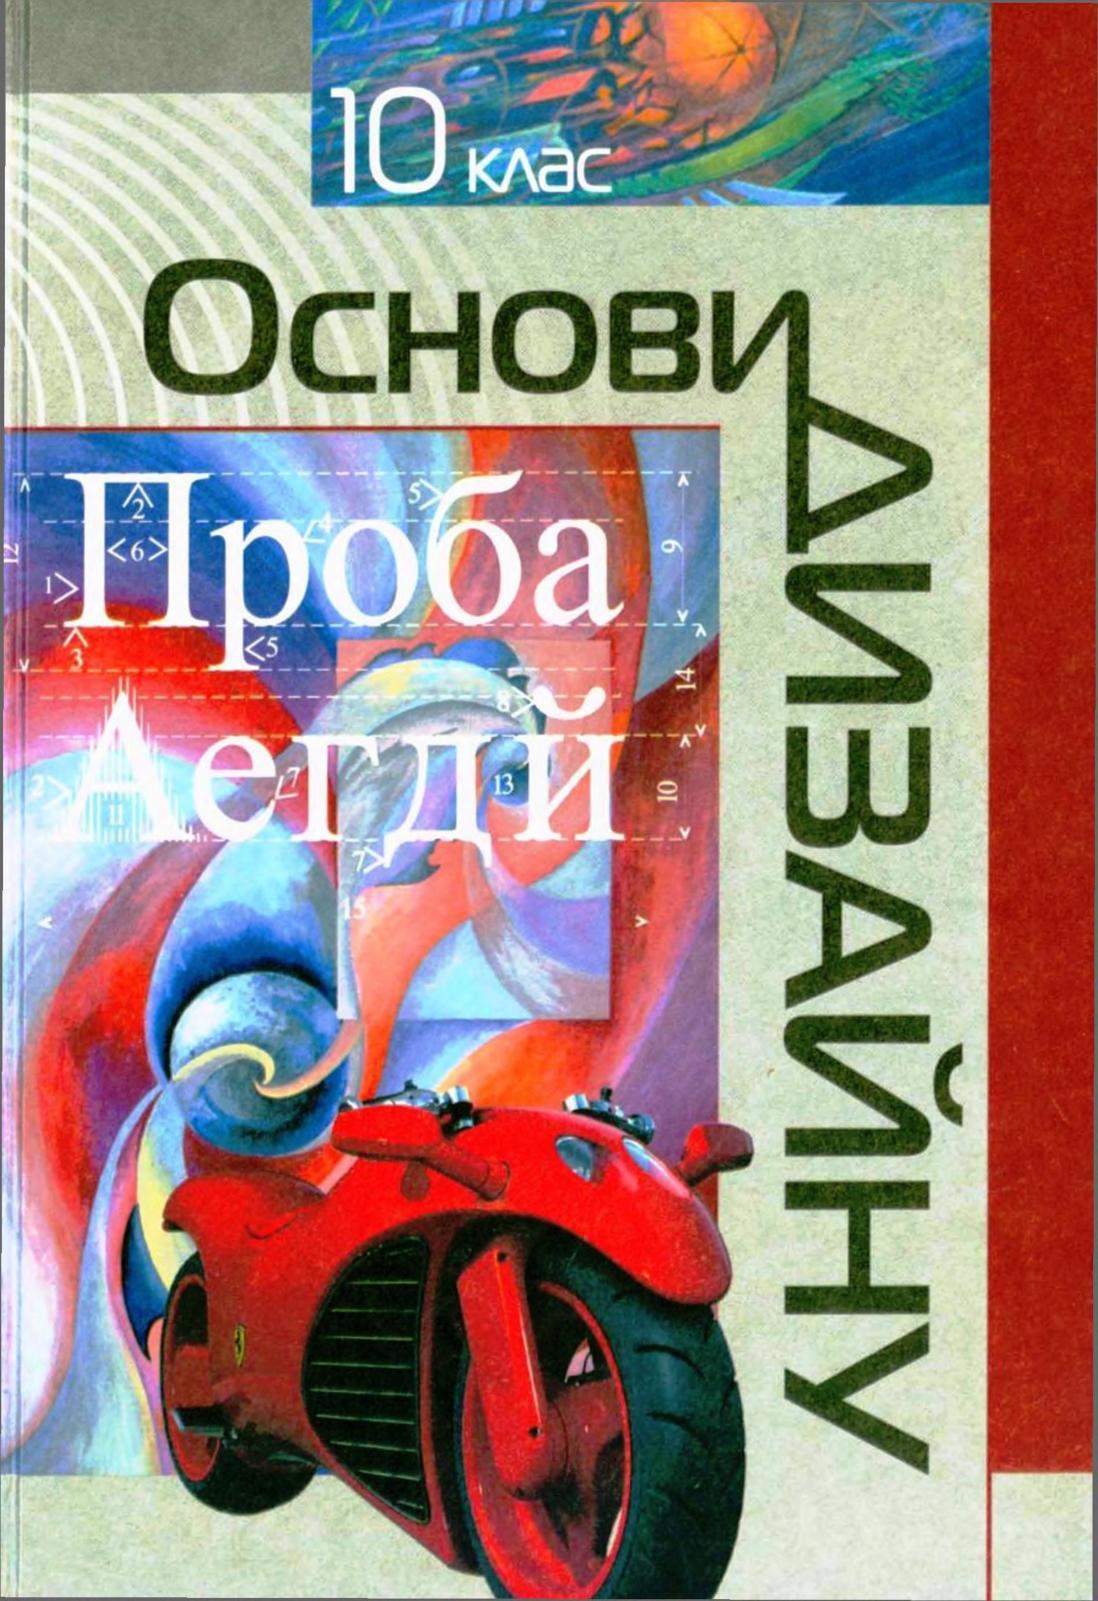 Calaméo - 10 класс. Основы дизайна Vdovchenko 2010 df271e7cbe859